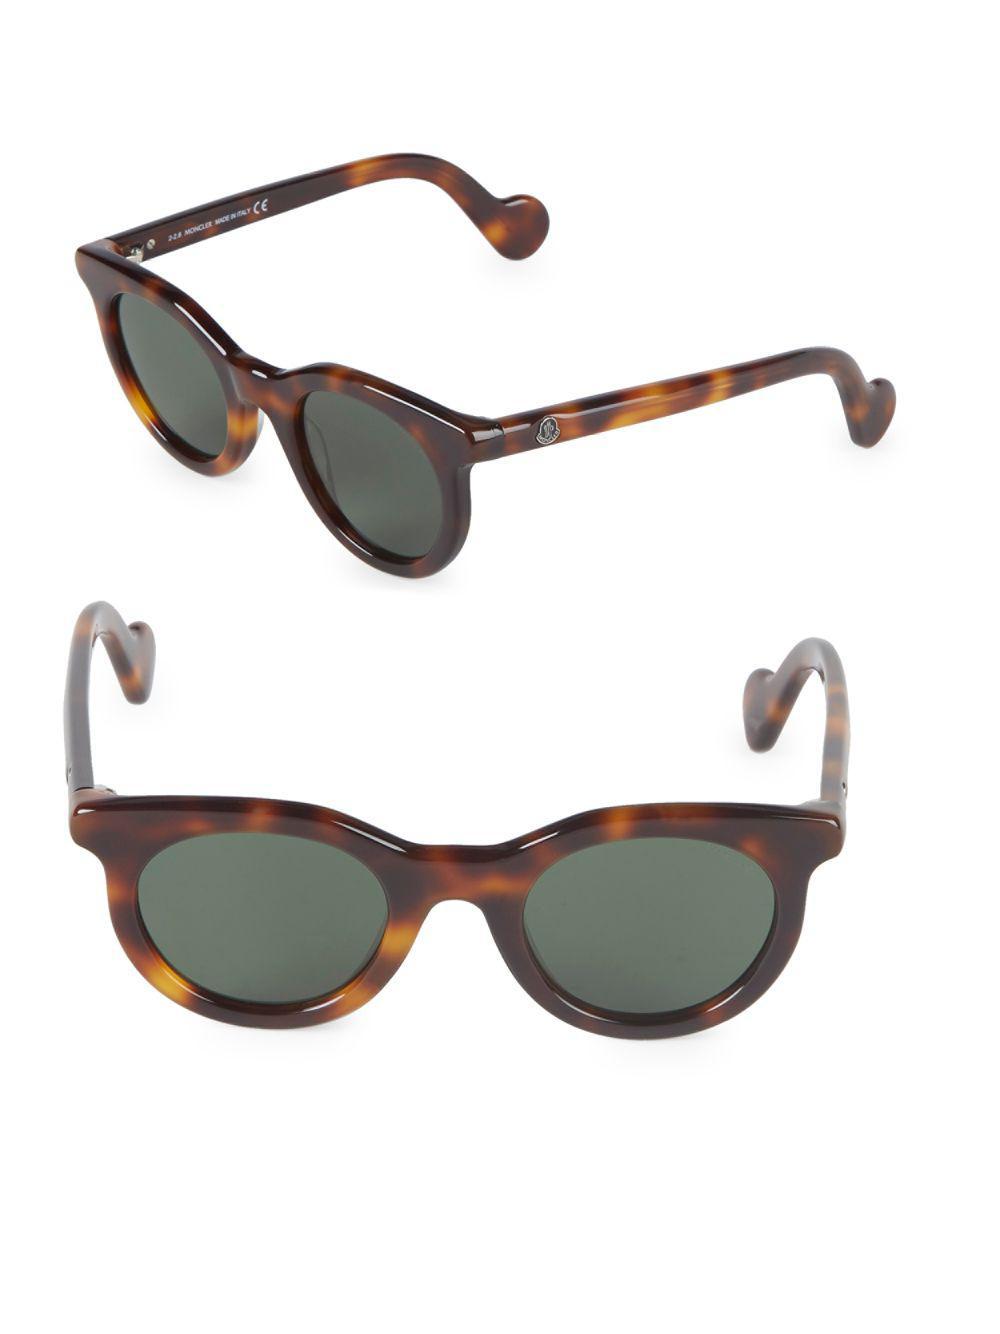 3fa149e50ec Moncler 47mm Cat-eye Sunglasses in Brown - Lyst